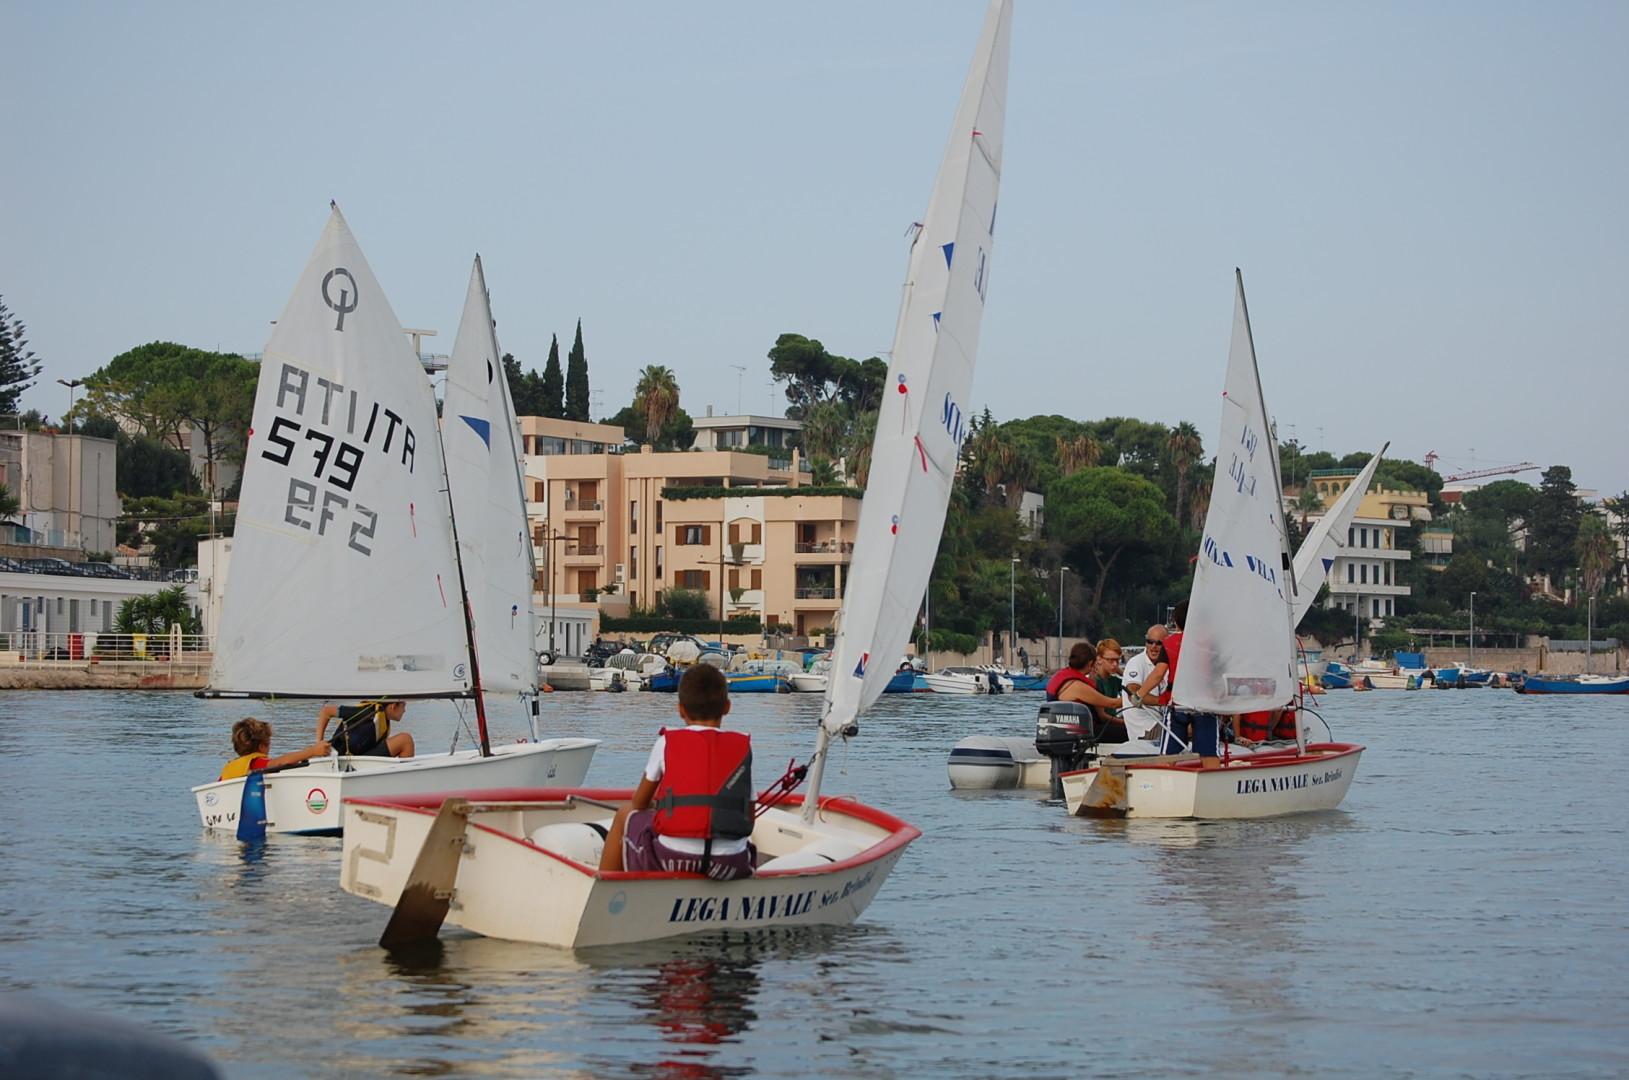 Scuola-di-vela-lega-navale-LNI-Brindisi (20)